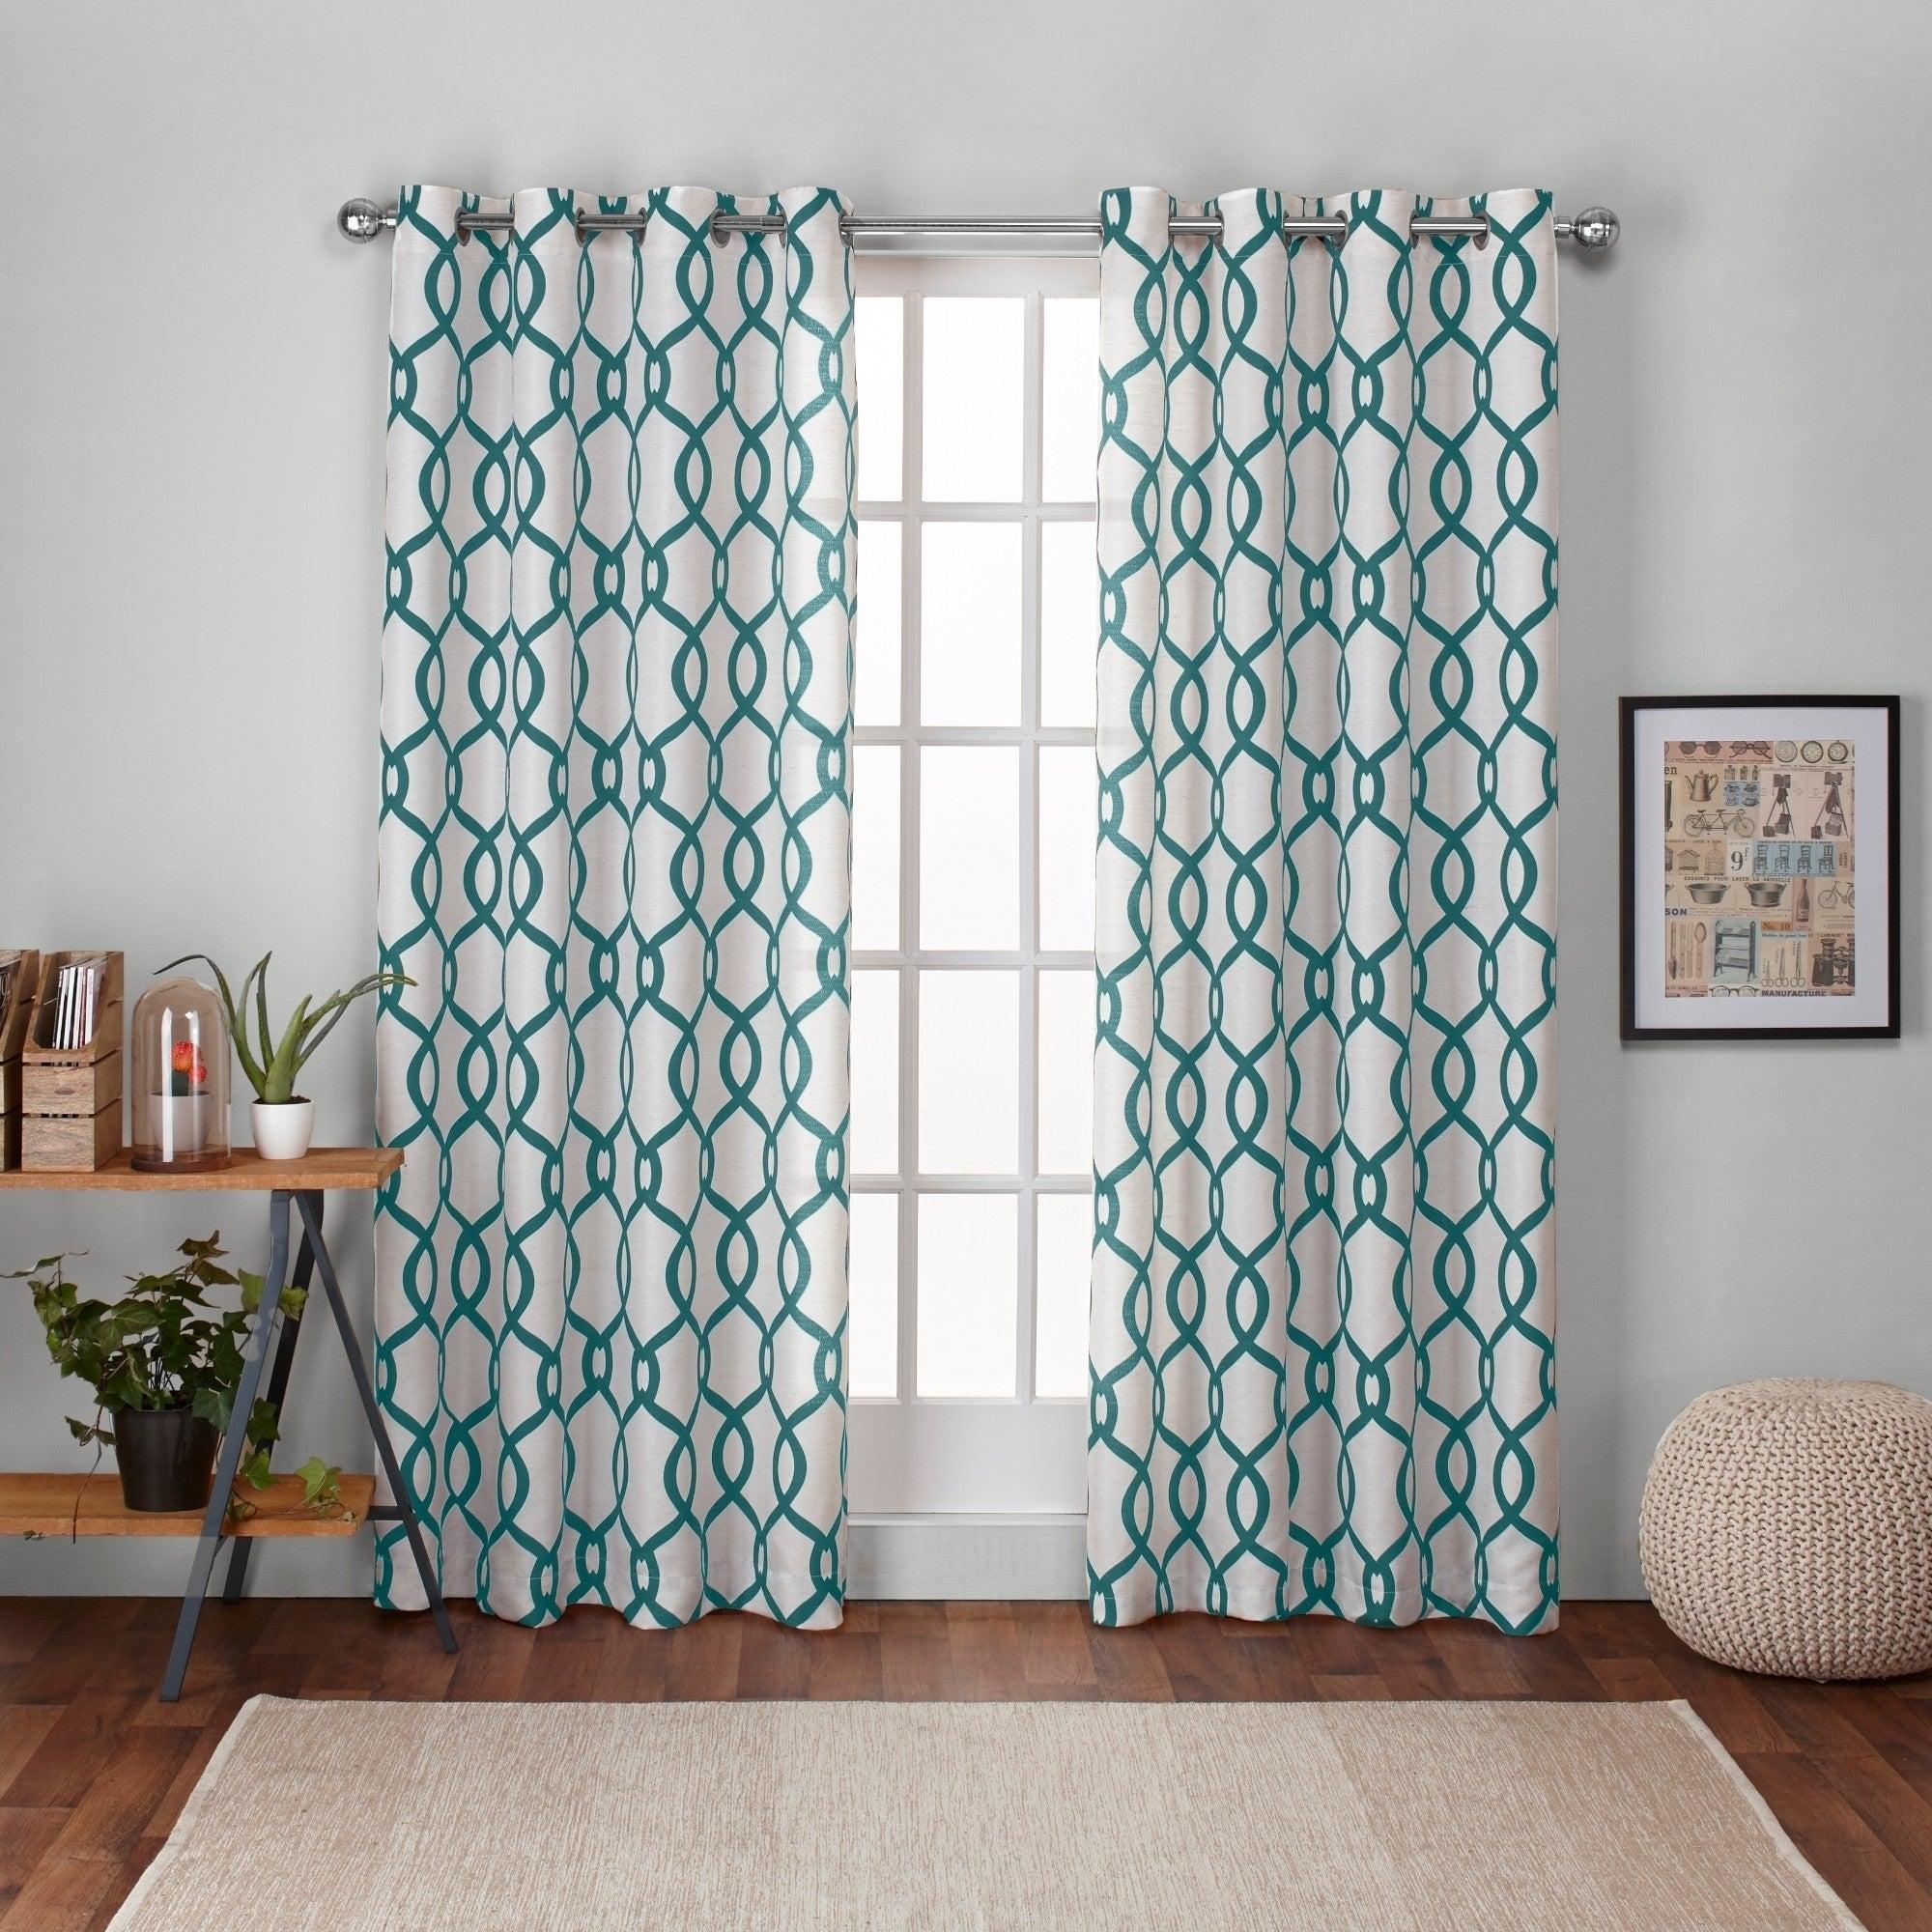 Details About Ati Home Kochi Linen Blend Window Grommet Top Curtain Panel Pair Within Velvet Heavyweight Grommet Top Curtain Panel Pairs (View 16 of 30)